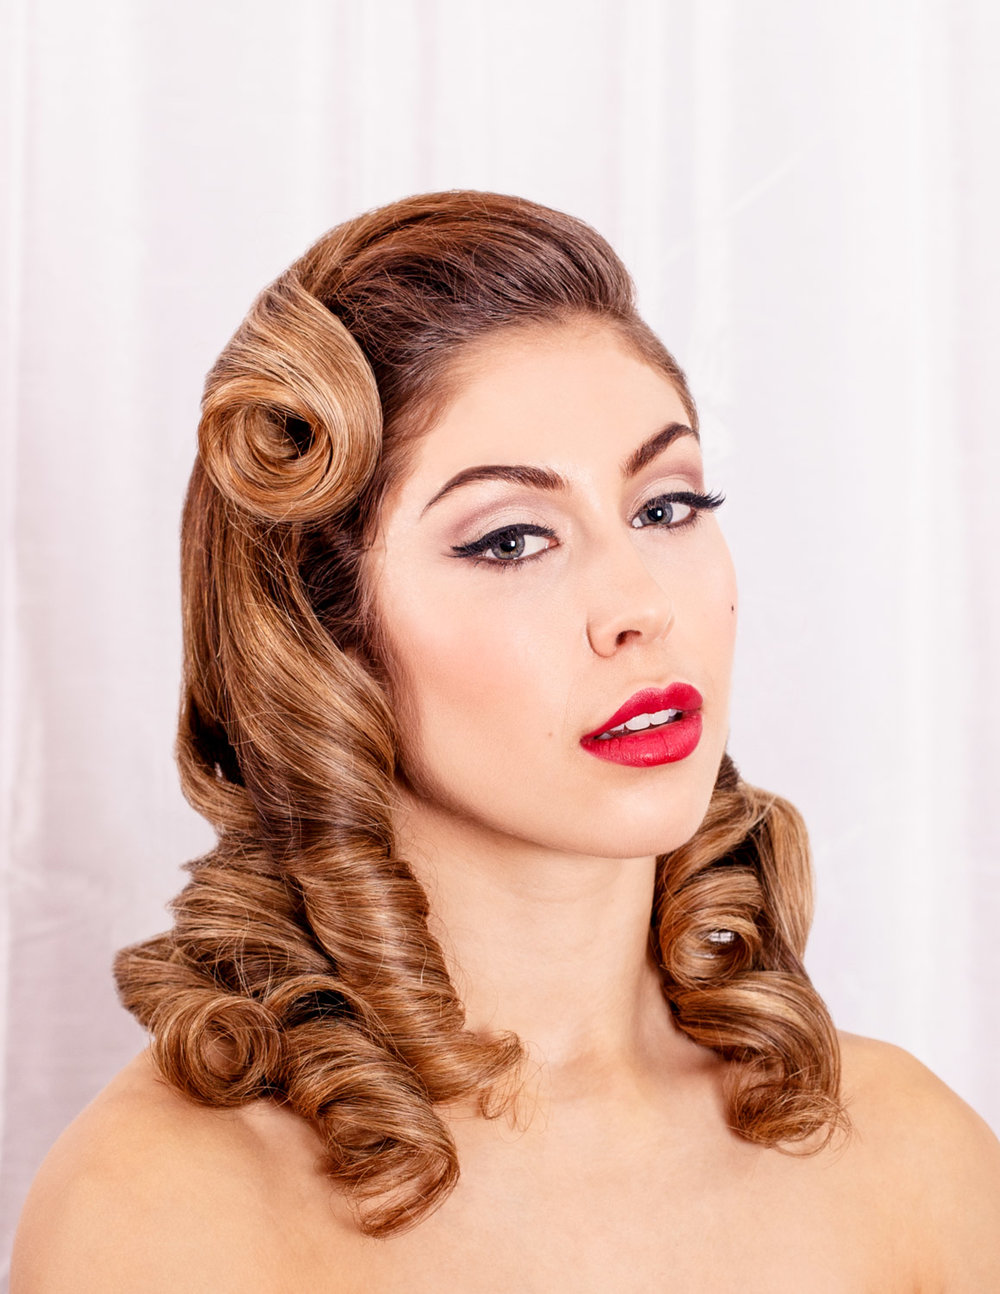 Salon shoot-7694.JPG